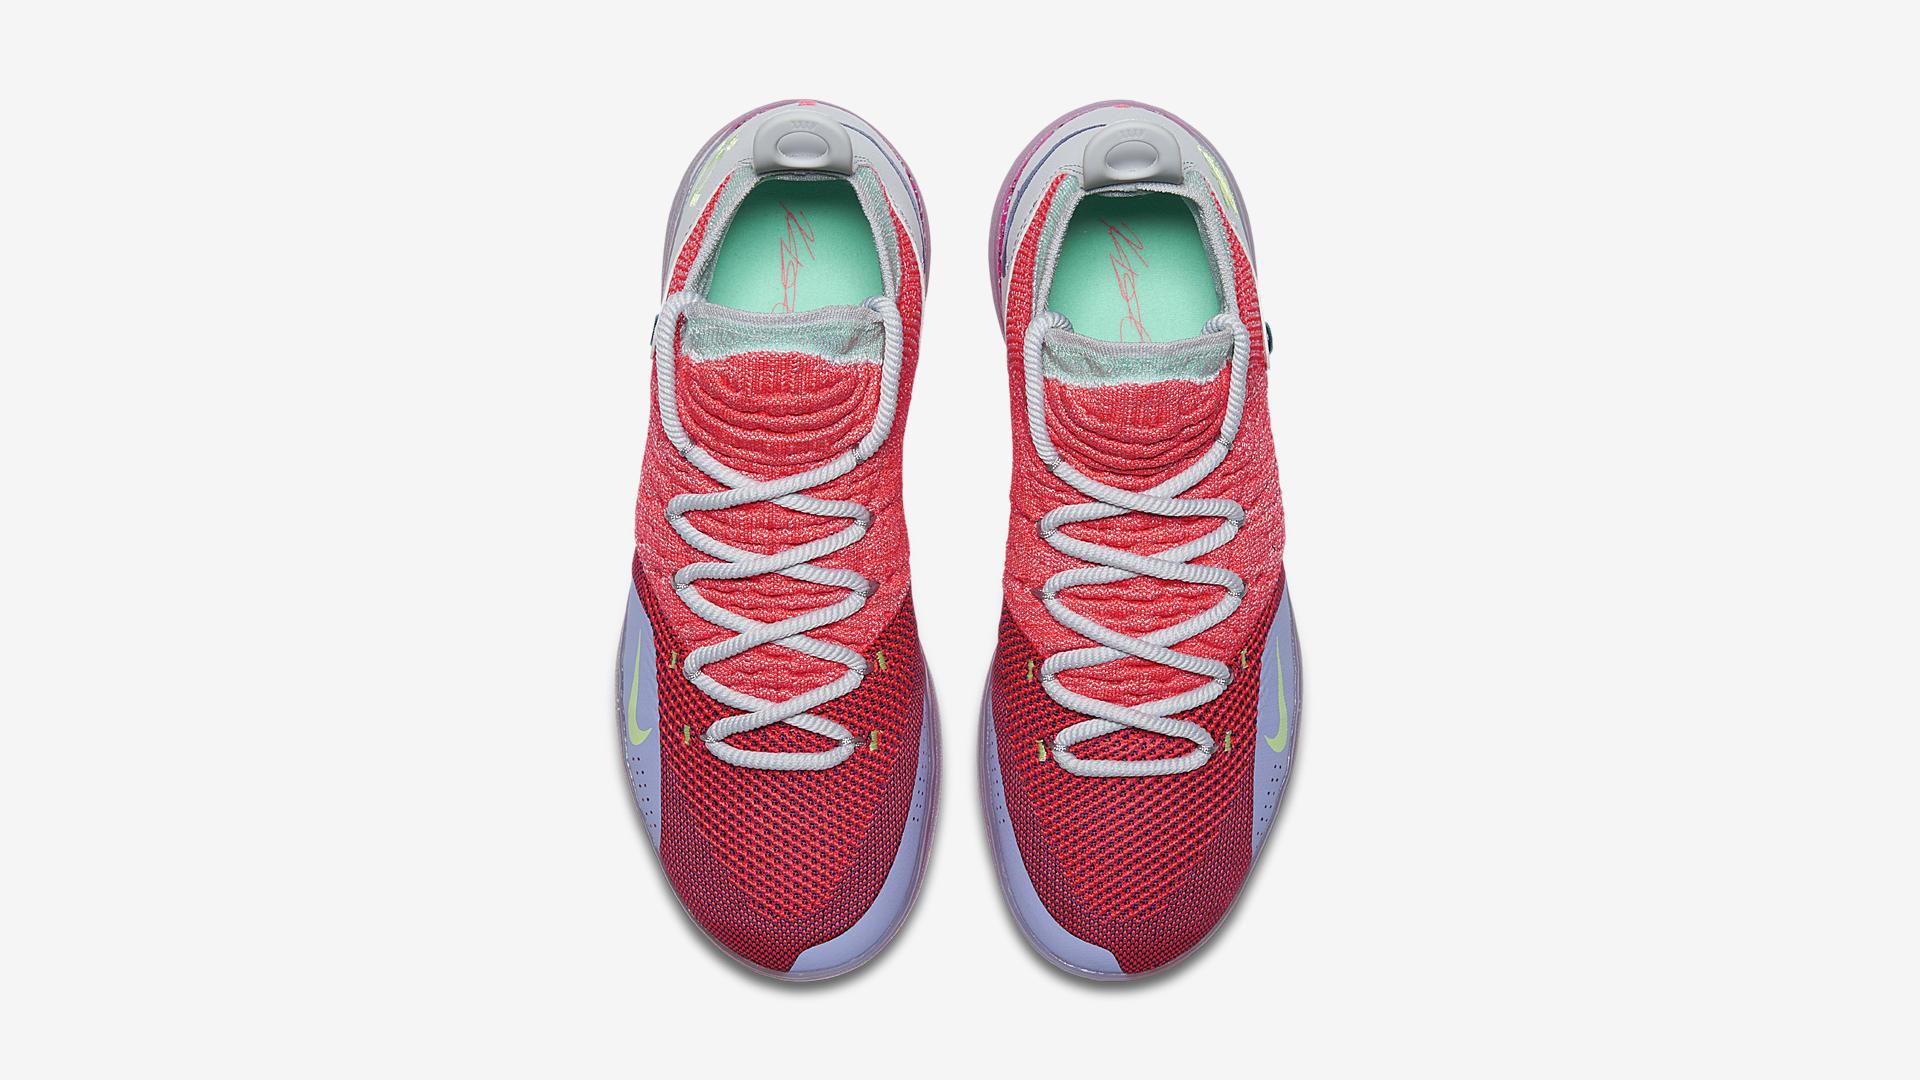 Nike Zoom KD 11 Hot Punch (AO2604-600)